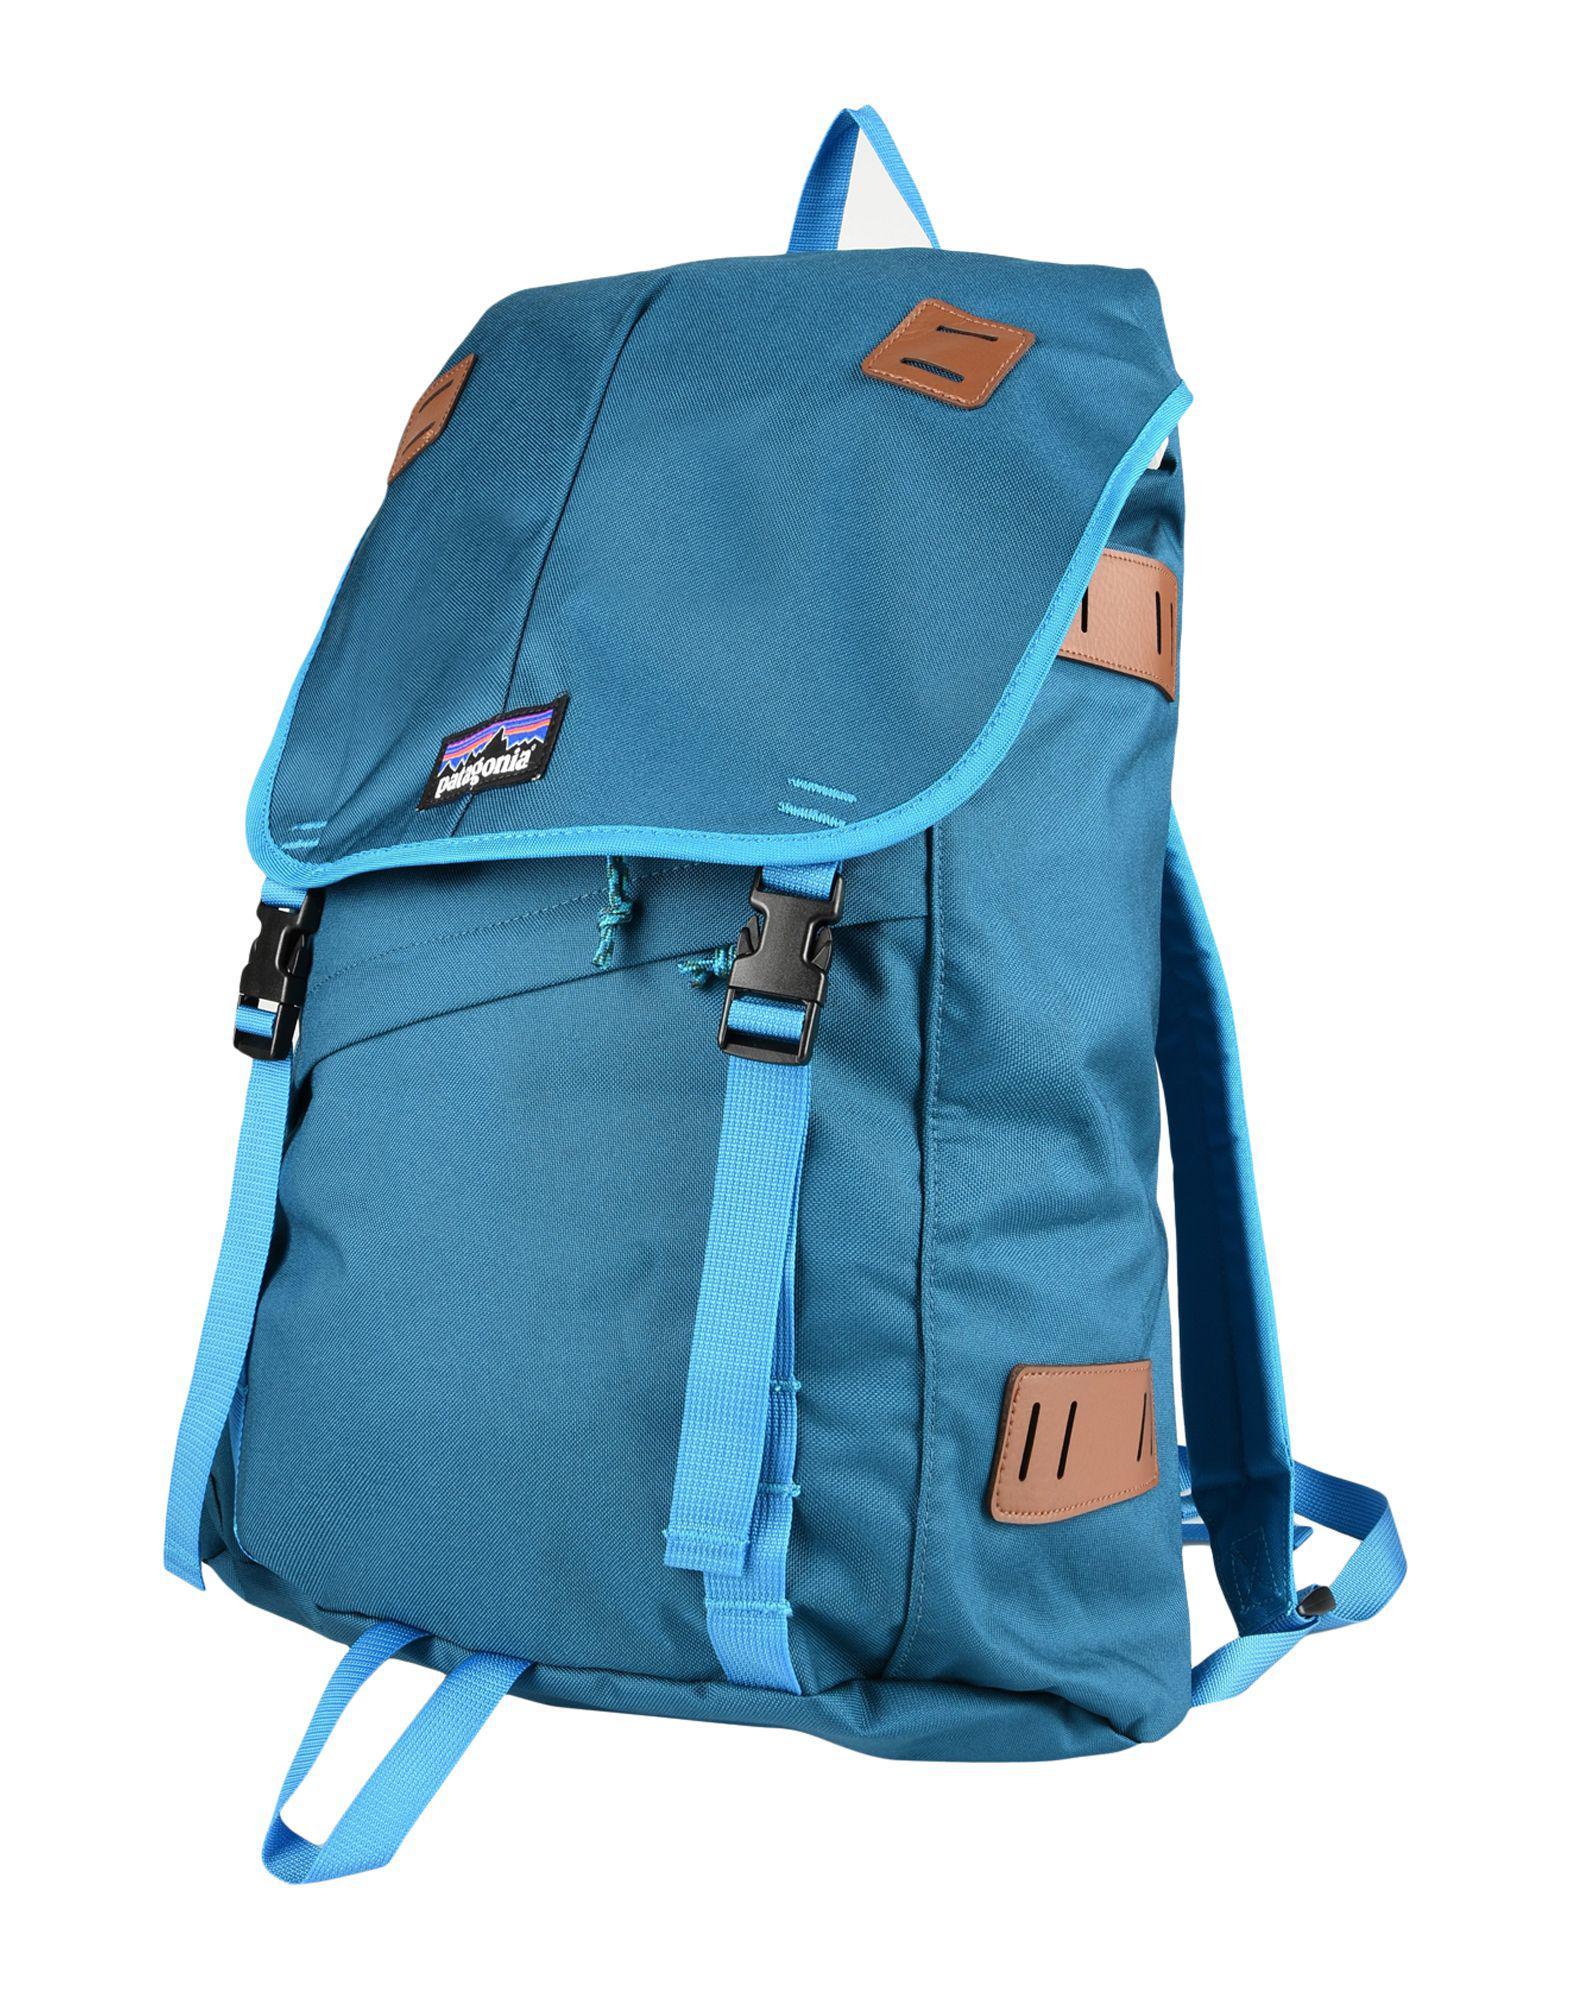 BAGS - Backpacks & Bum bags Patagonia gRVXI5ATxd